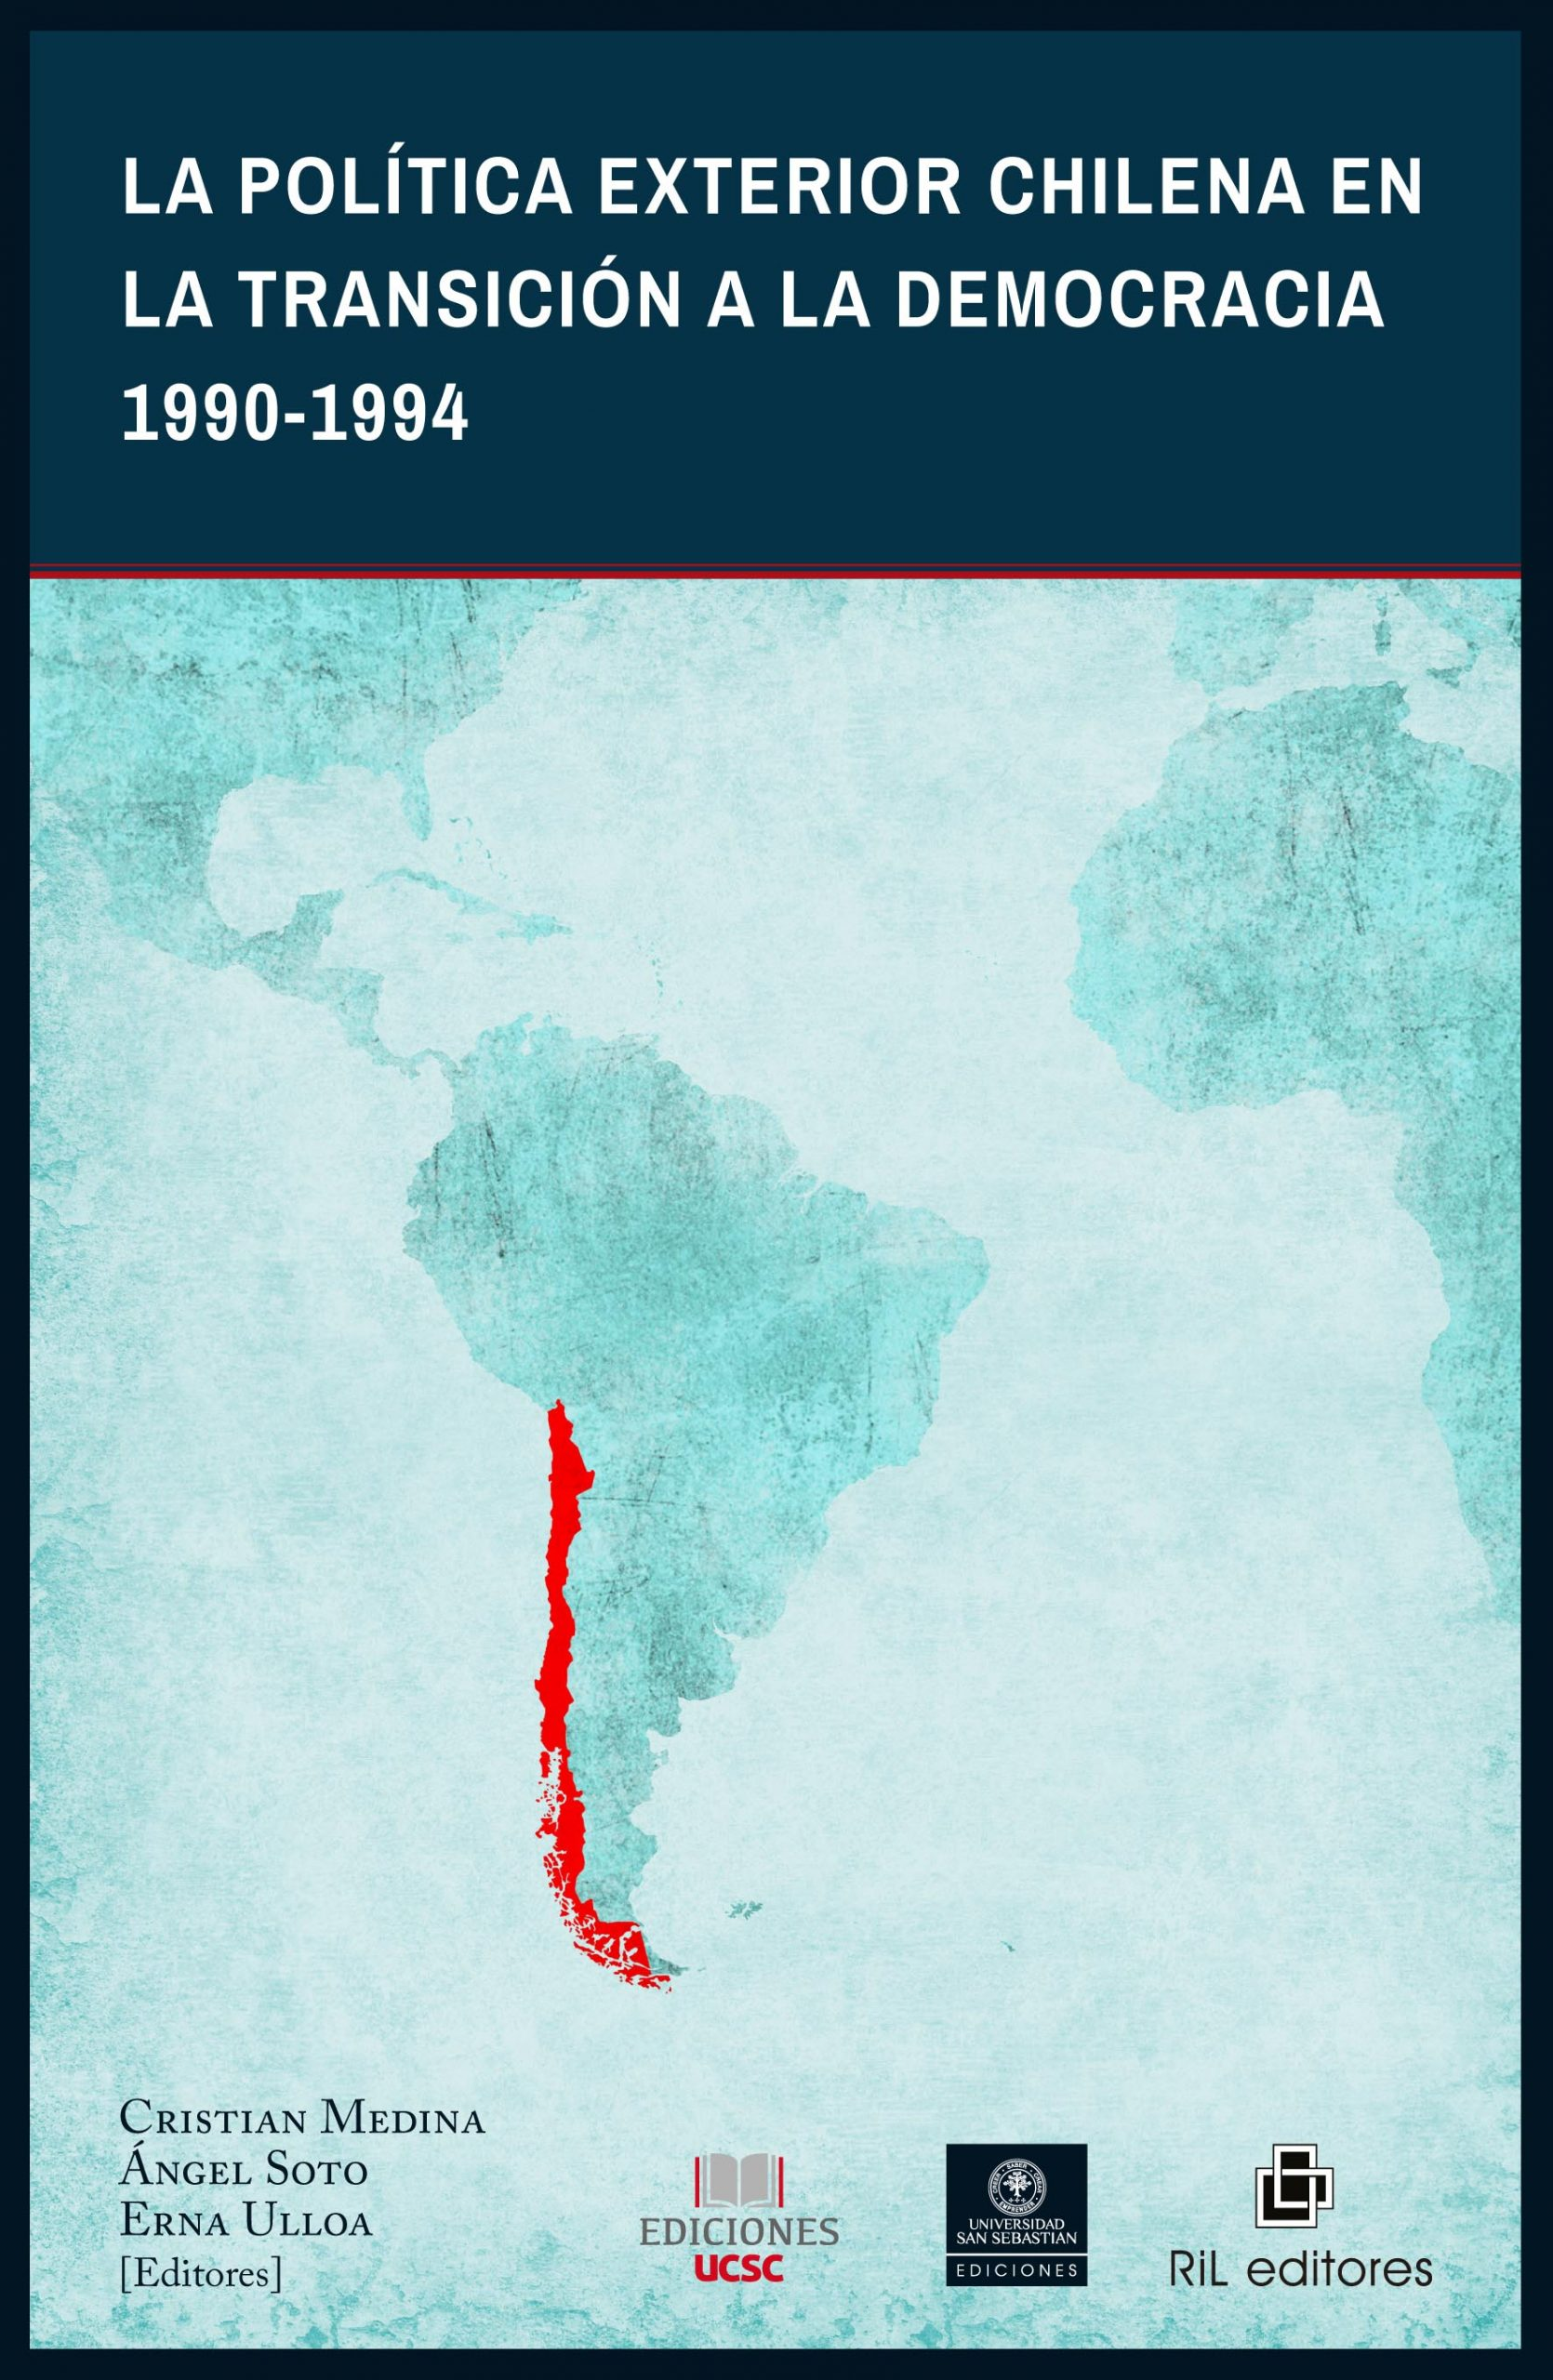 9788418065453 - Medina, Cristian - 2021 - La política exterior chilena-1